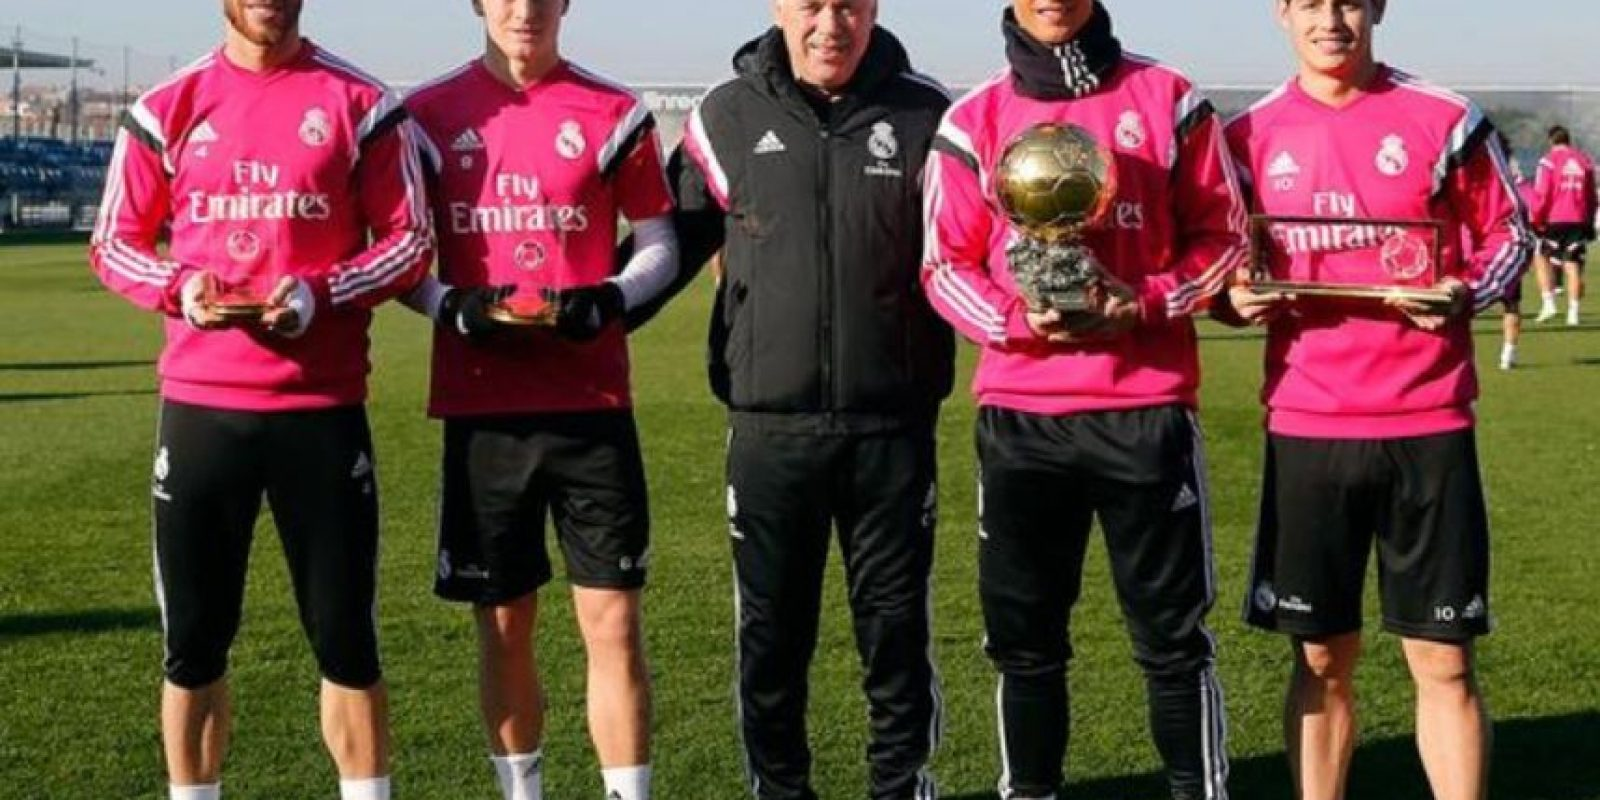 Sergio Ramos, Toni Kroos, Carlo Ancelotti, Cristiano Ronaldo y James Rodriguez. Foto:twitter.com/realmadrid